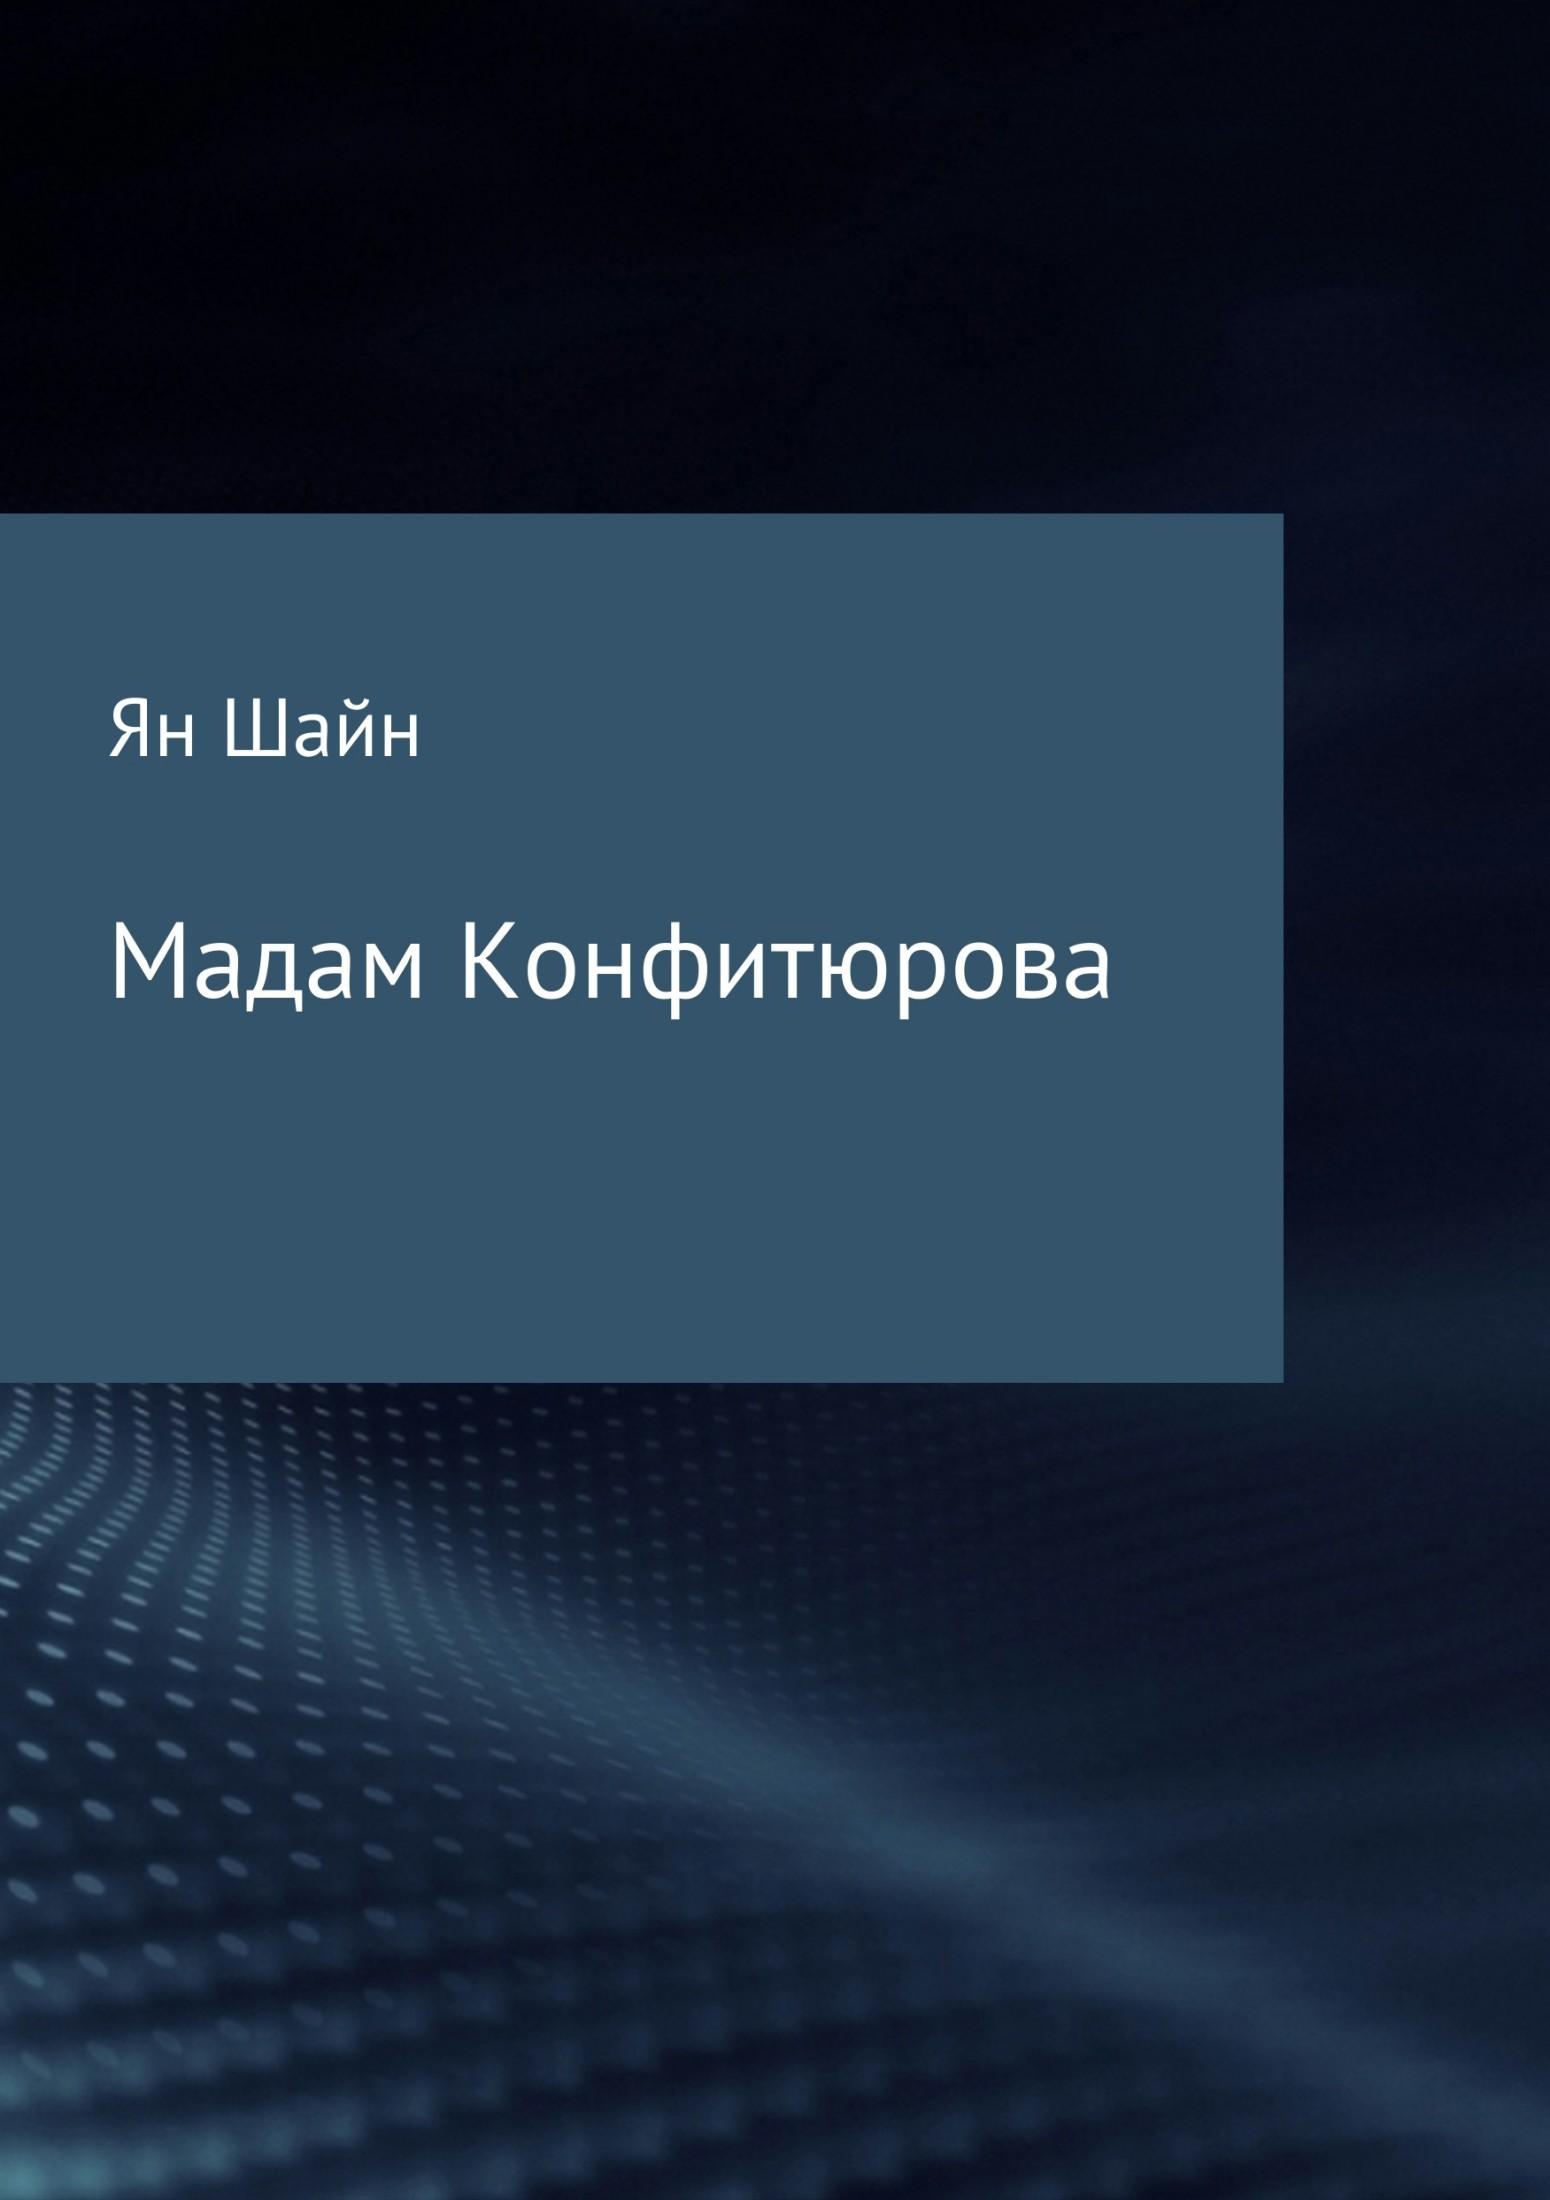 Ян Борисович Шайн Мадам Конфитюрова